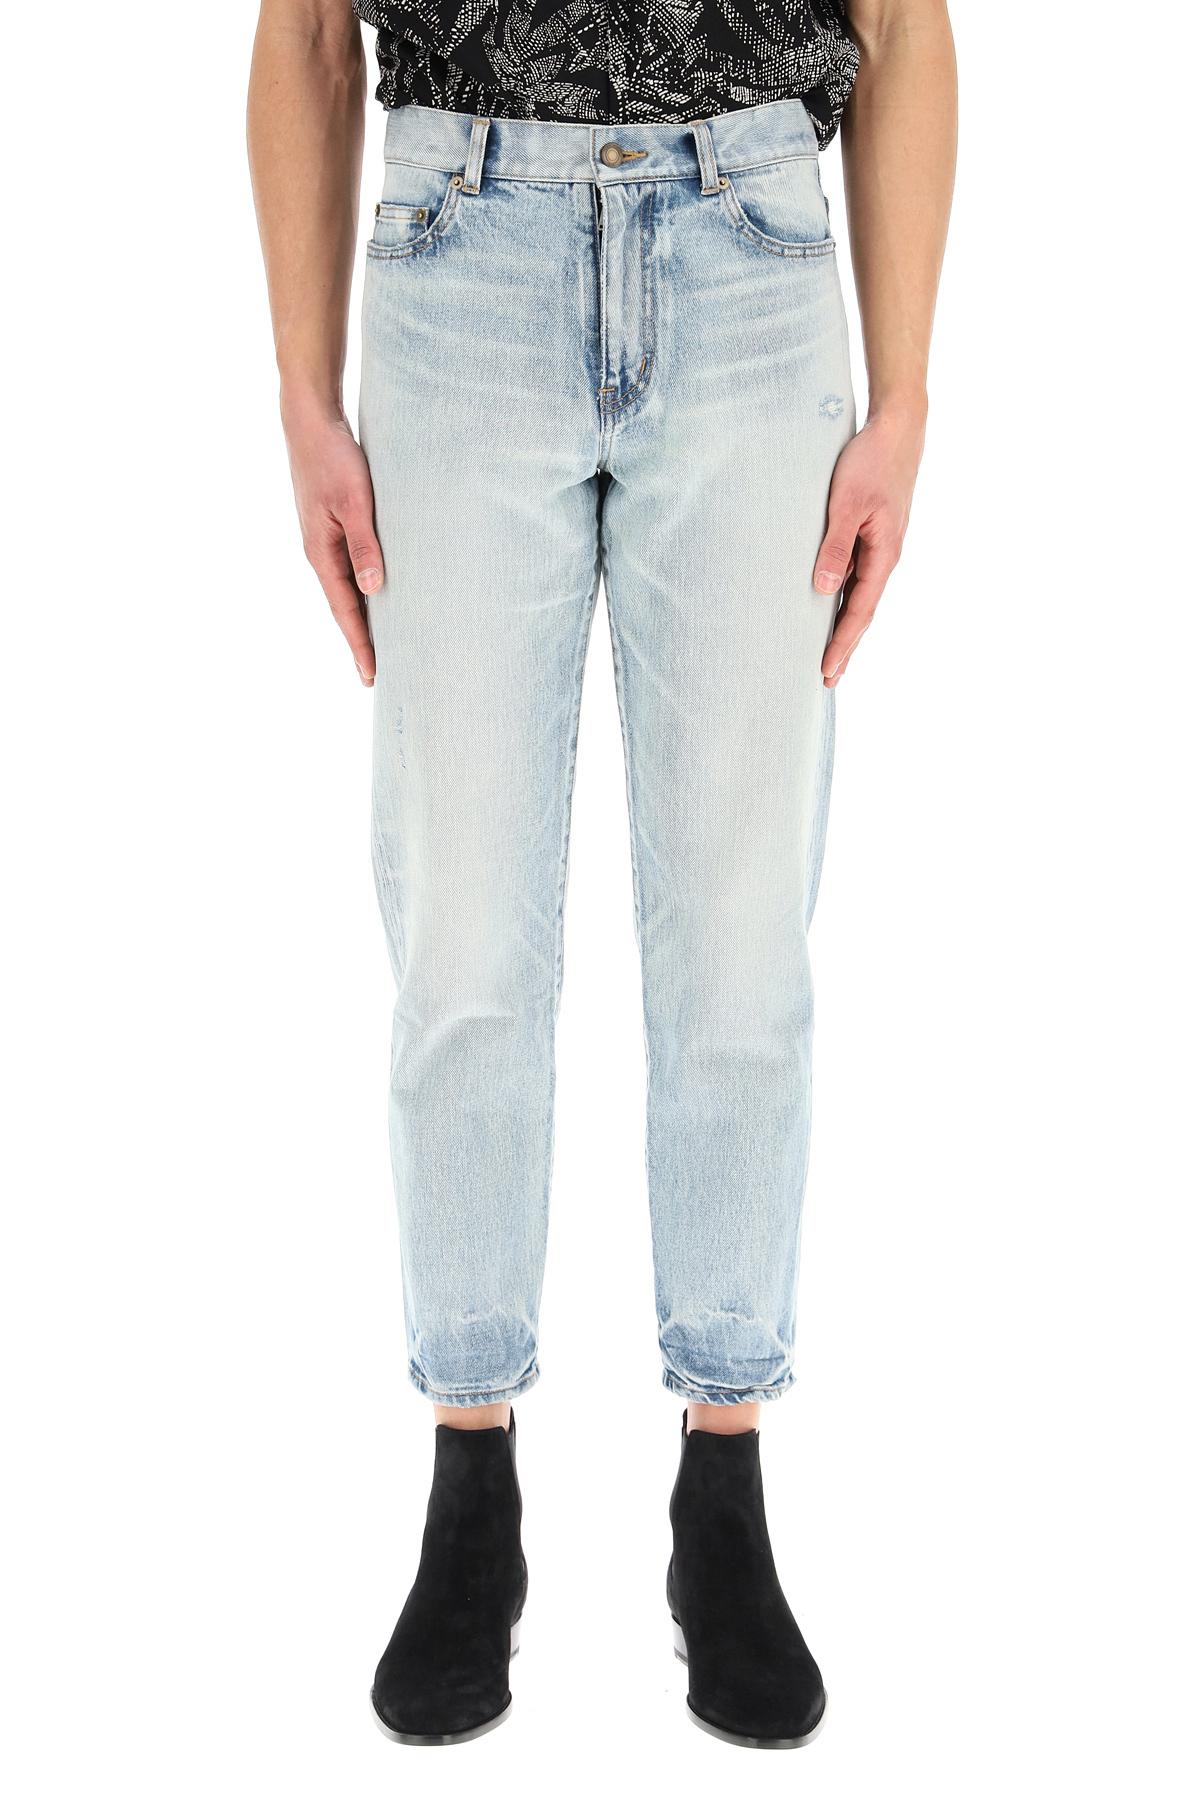 Saint laurent jeans carrot fit grey off white